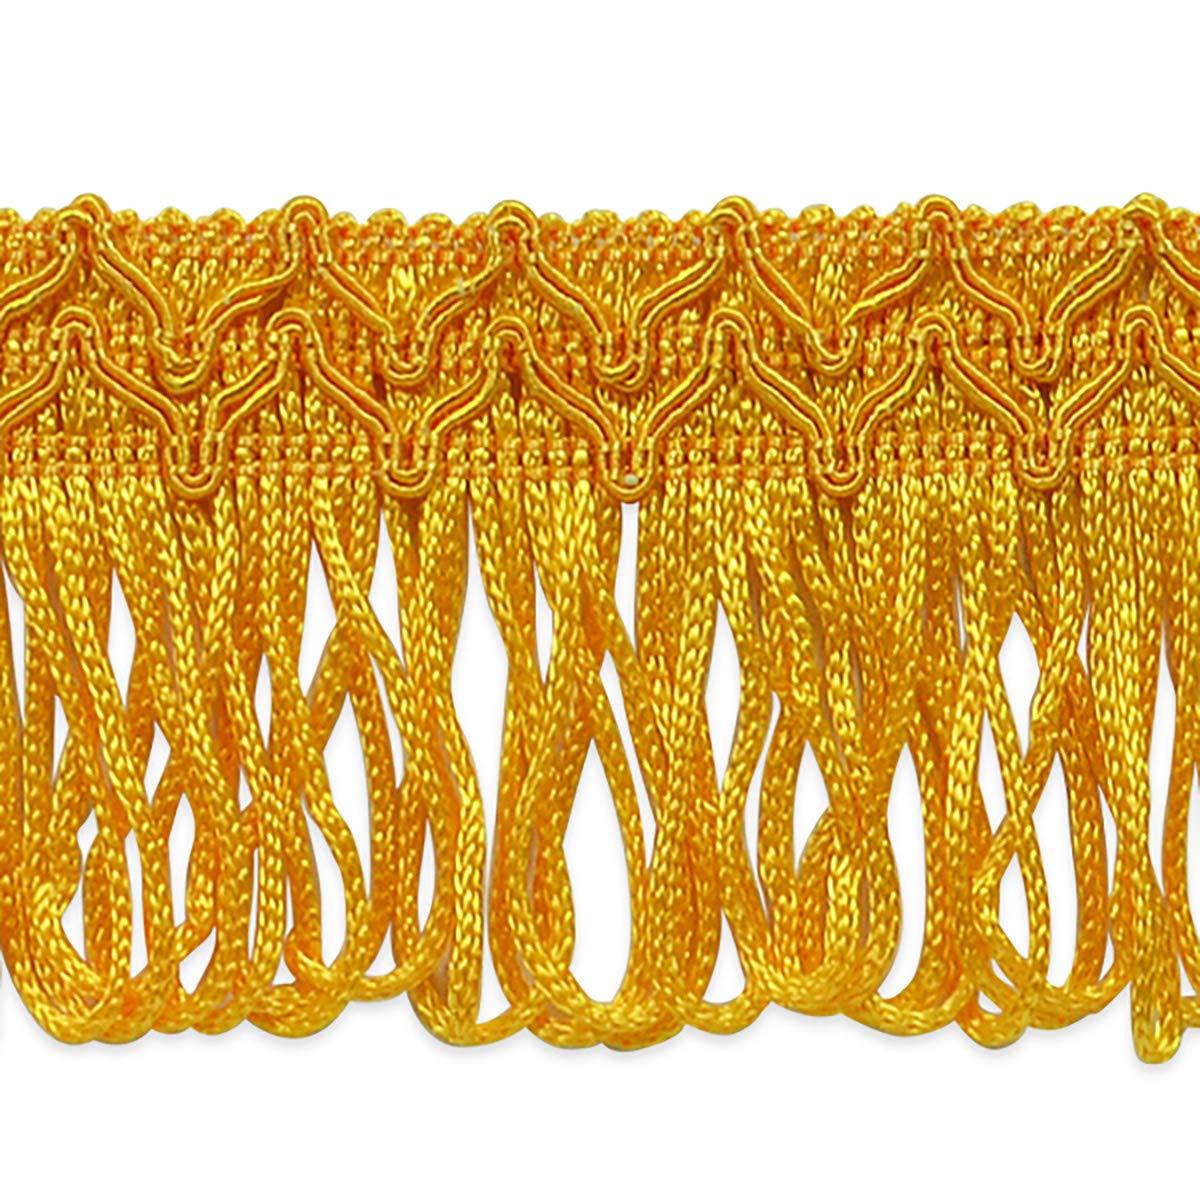 Sharlene 2in Loop Chainette Fringe Trim Gold (Precut 20 Yard) by Expo International Inc.